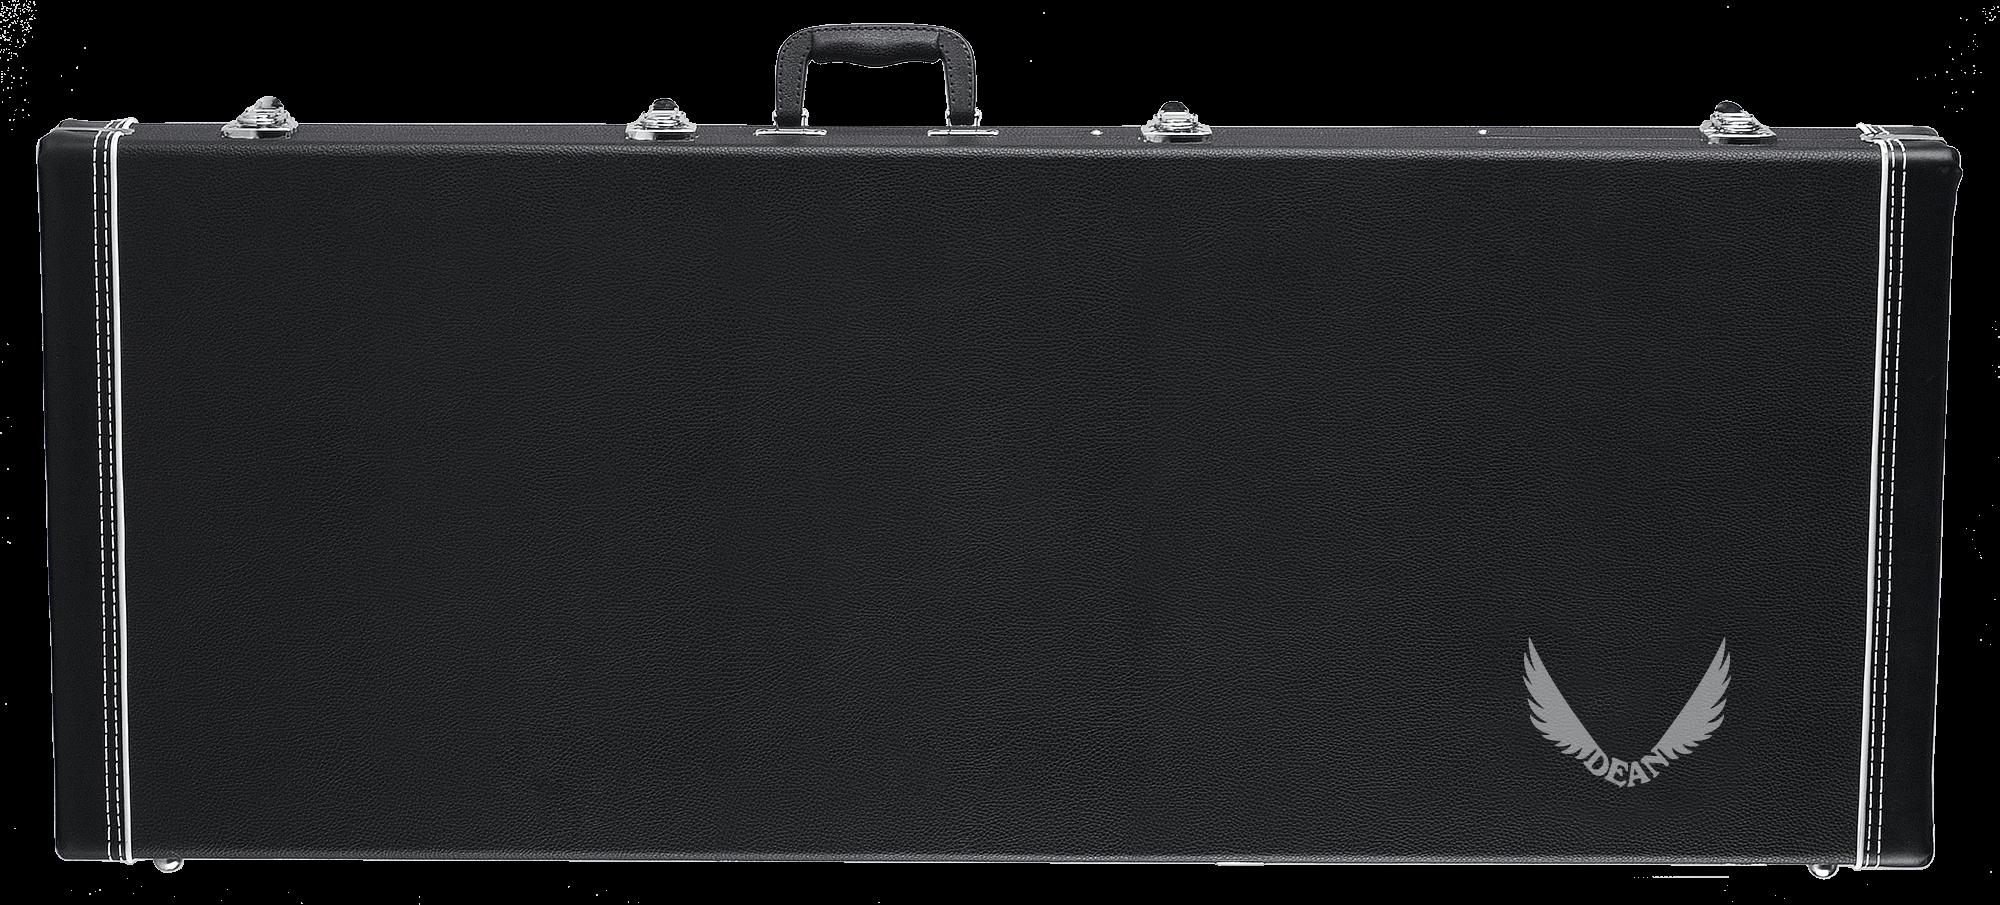 Dean Deluxe Hard Case ML Series